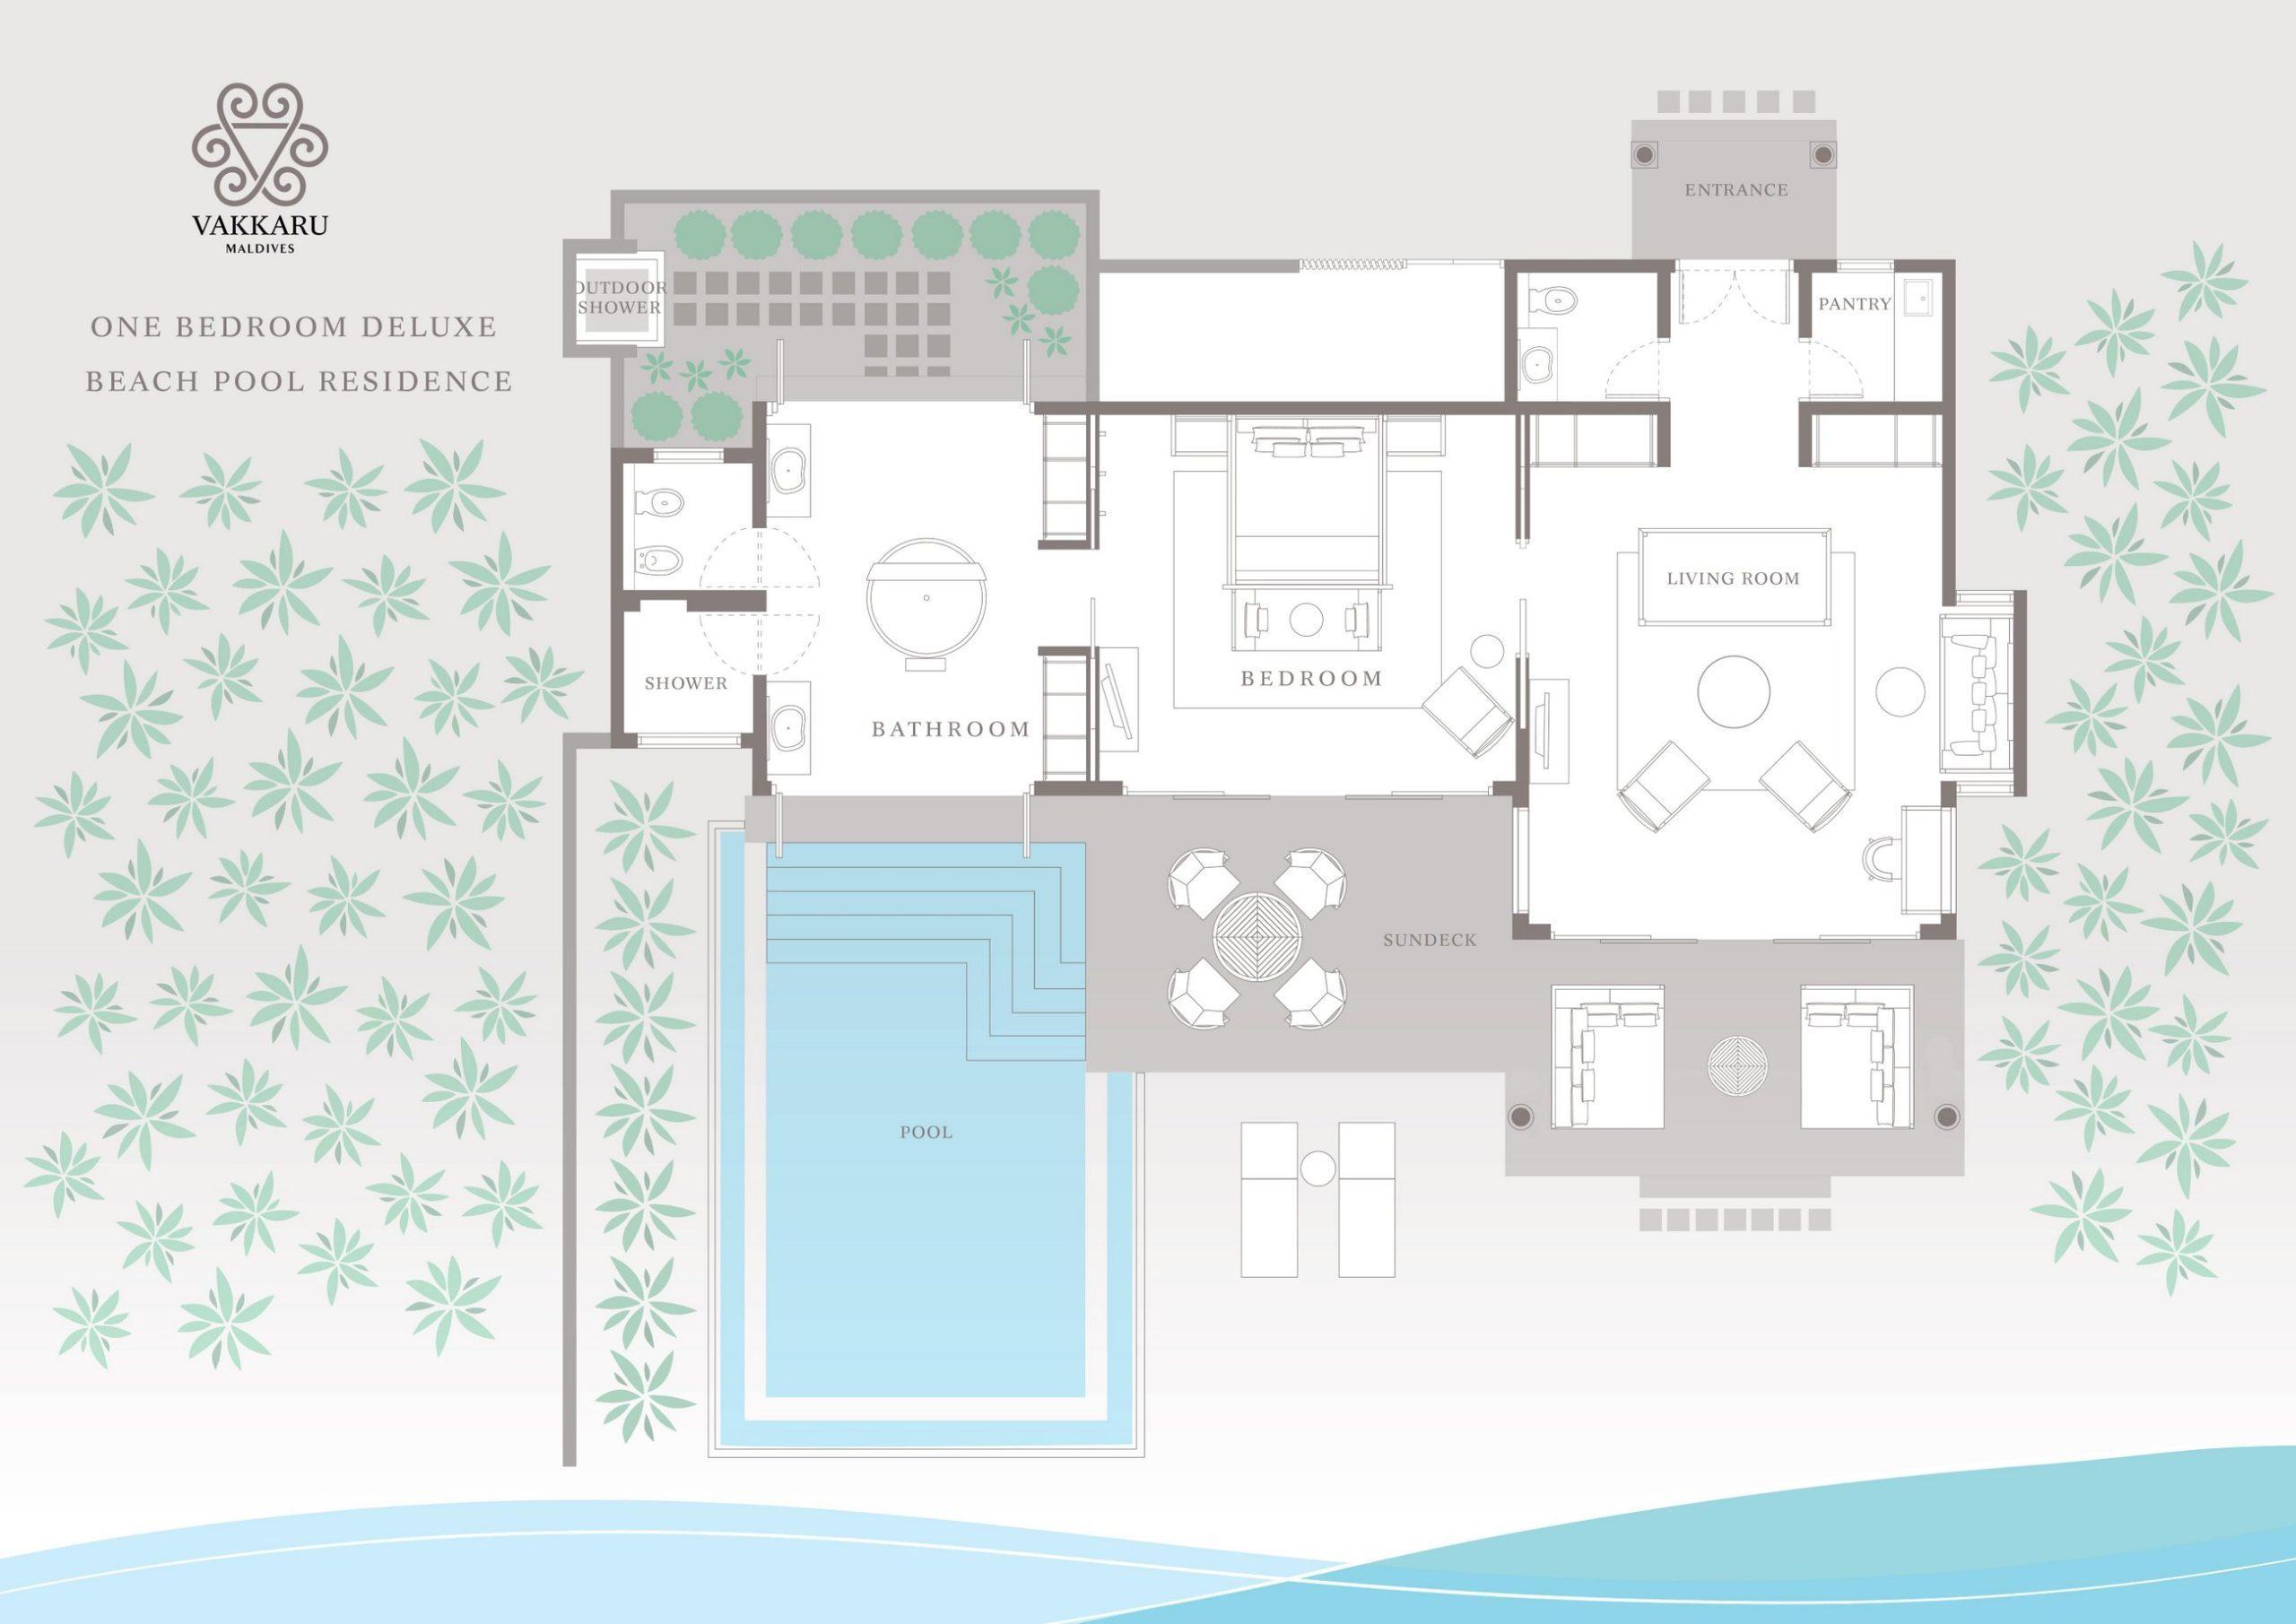 Мальдивы, отель Vakkaru Maldives, план-схема номера Deluxe Beach Pool Residence